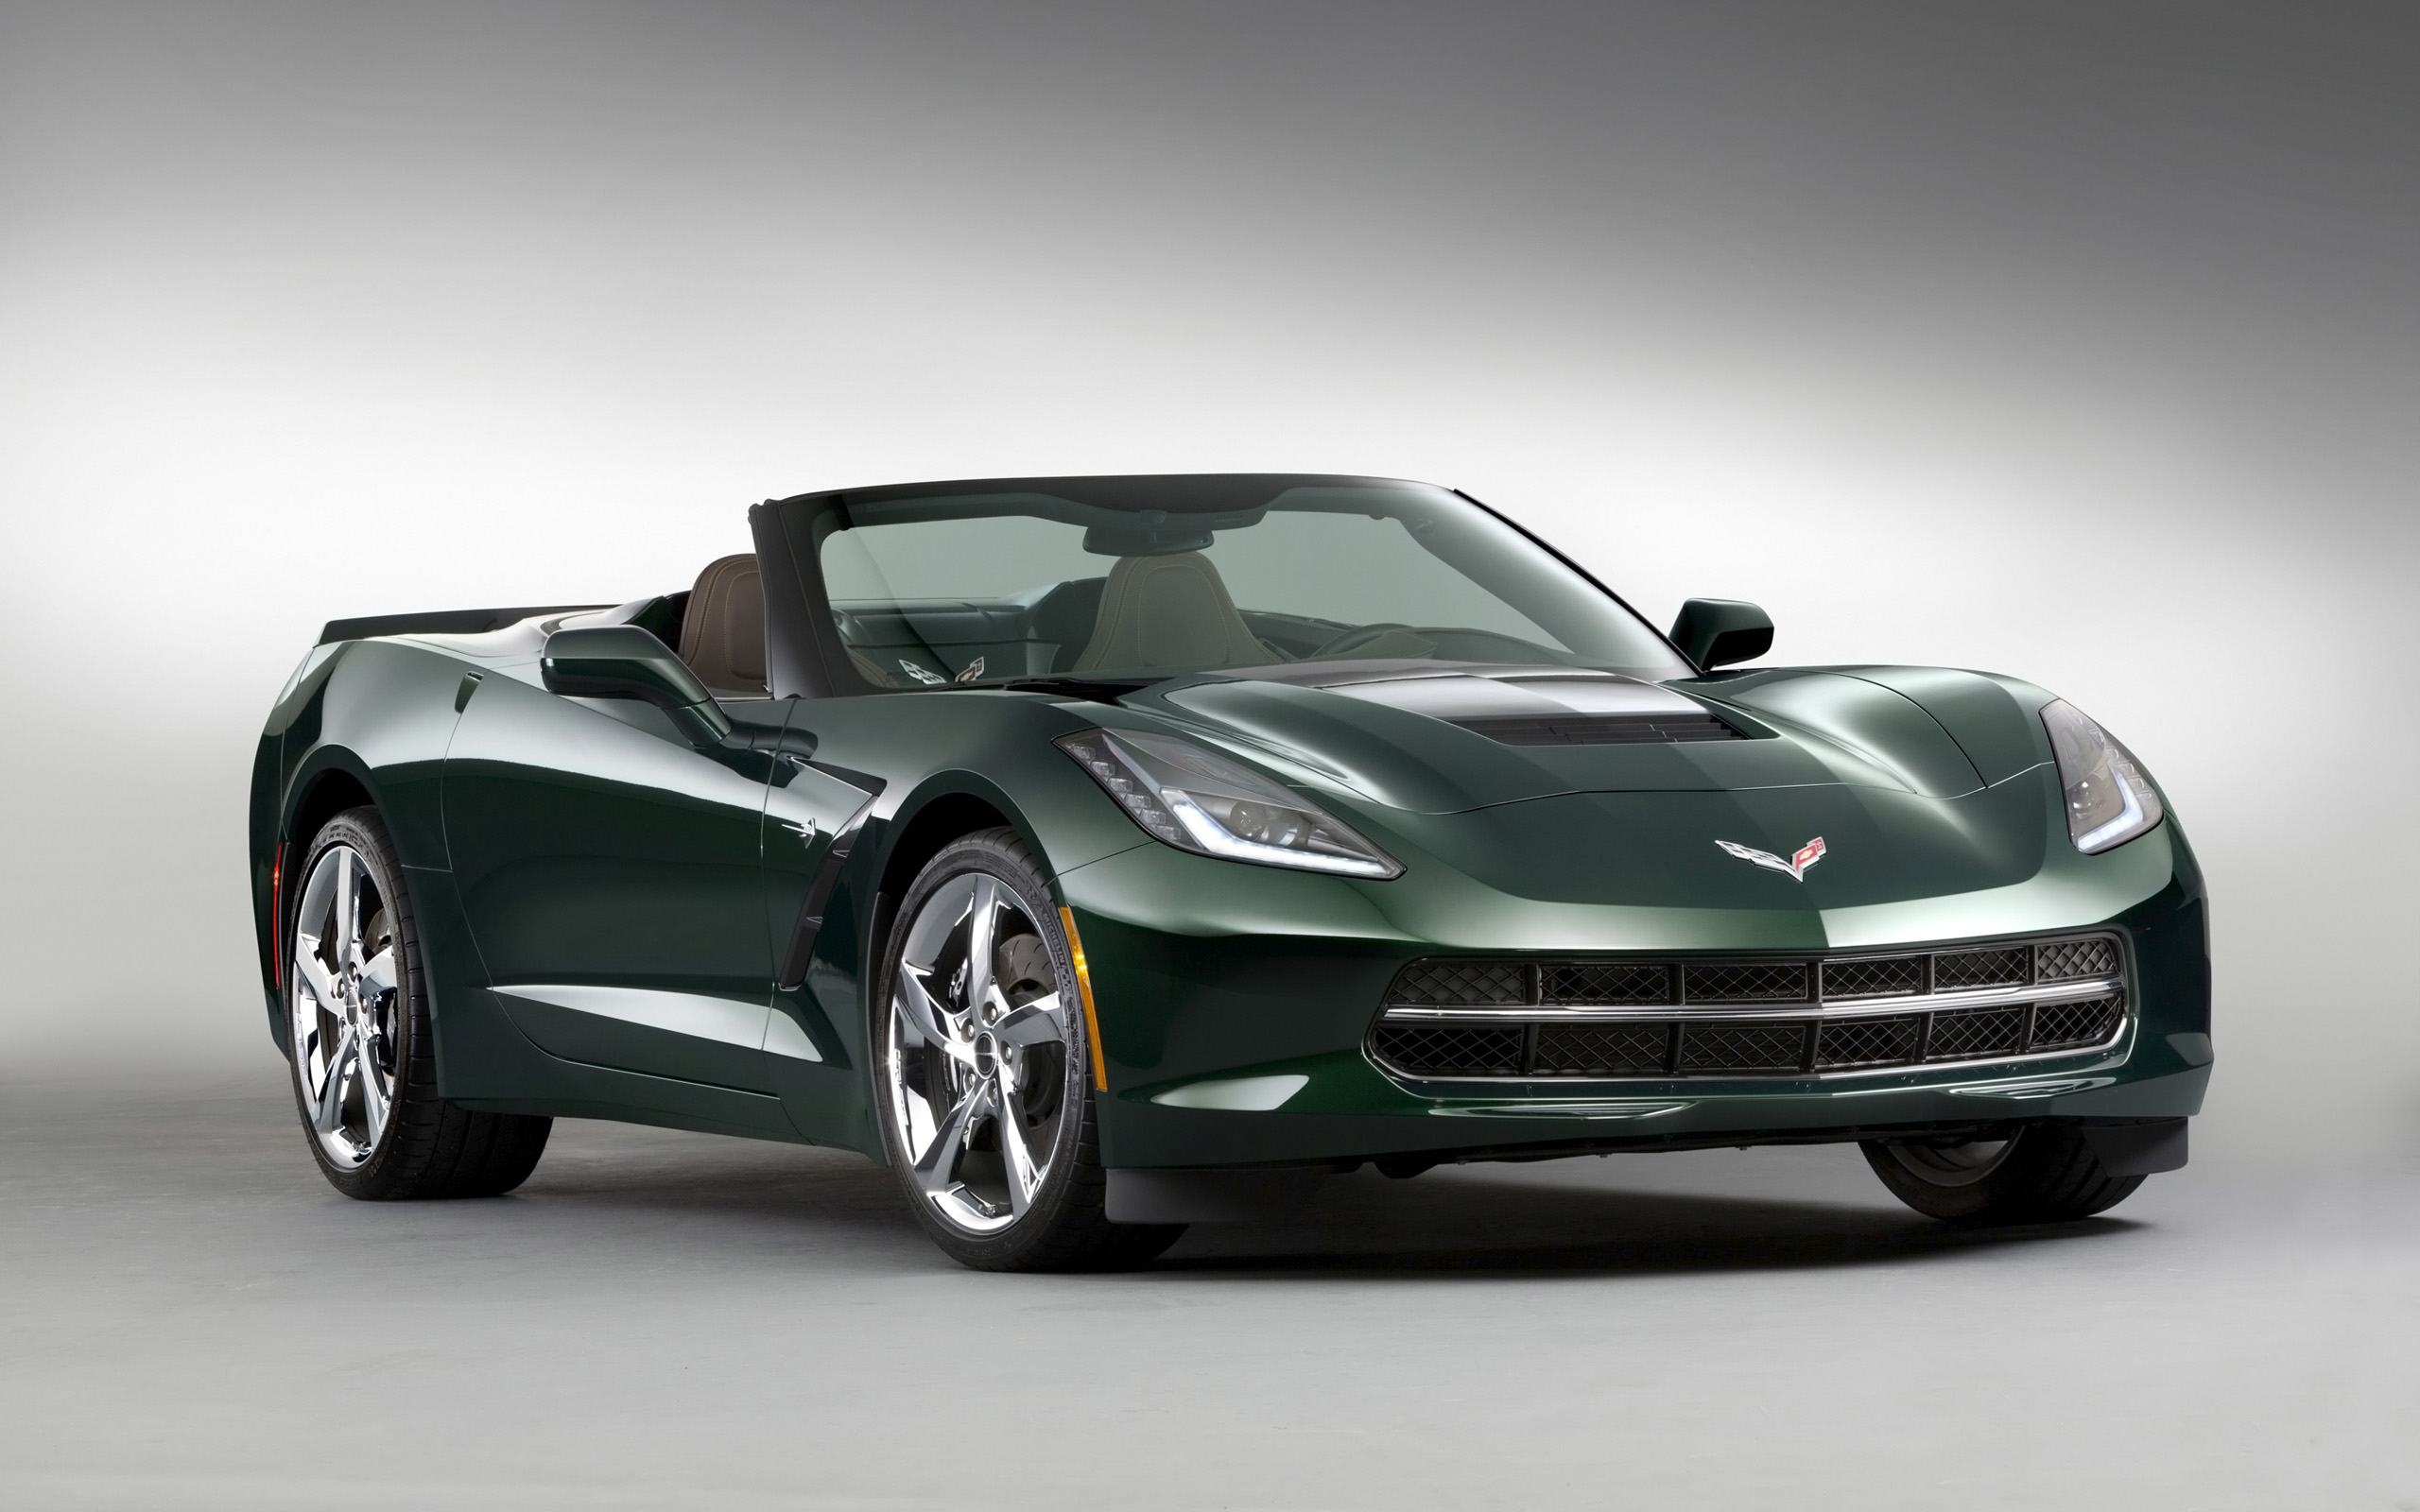 2014 corvette stingray premiere edition convertible wallpaper hd car. Cars Review. Best American Auto & Cars Review